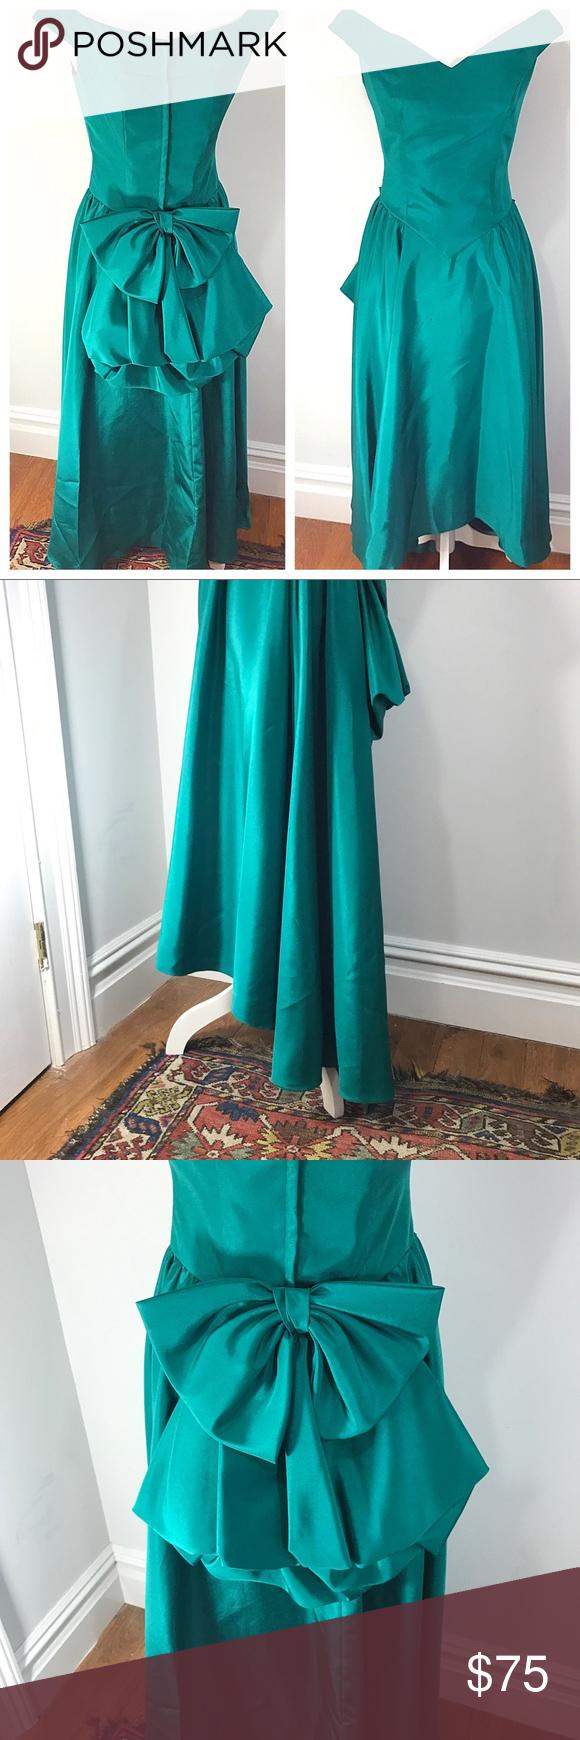 Vintage s prom dress princess fit